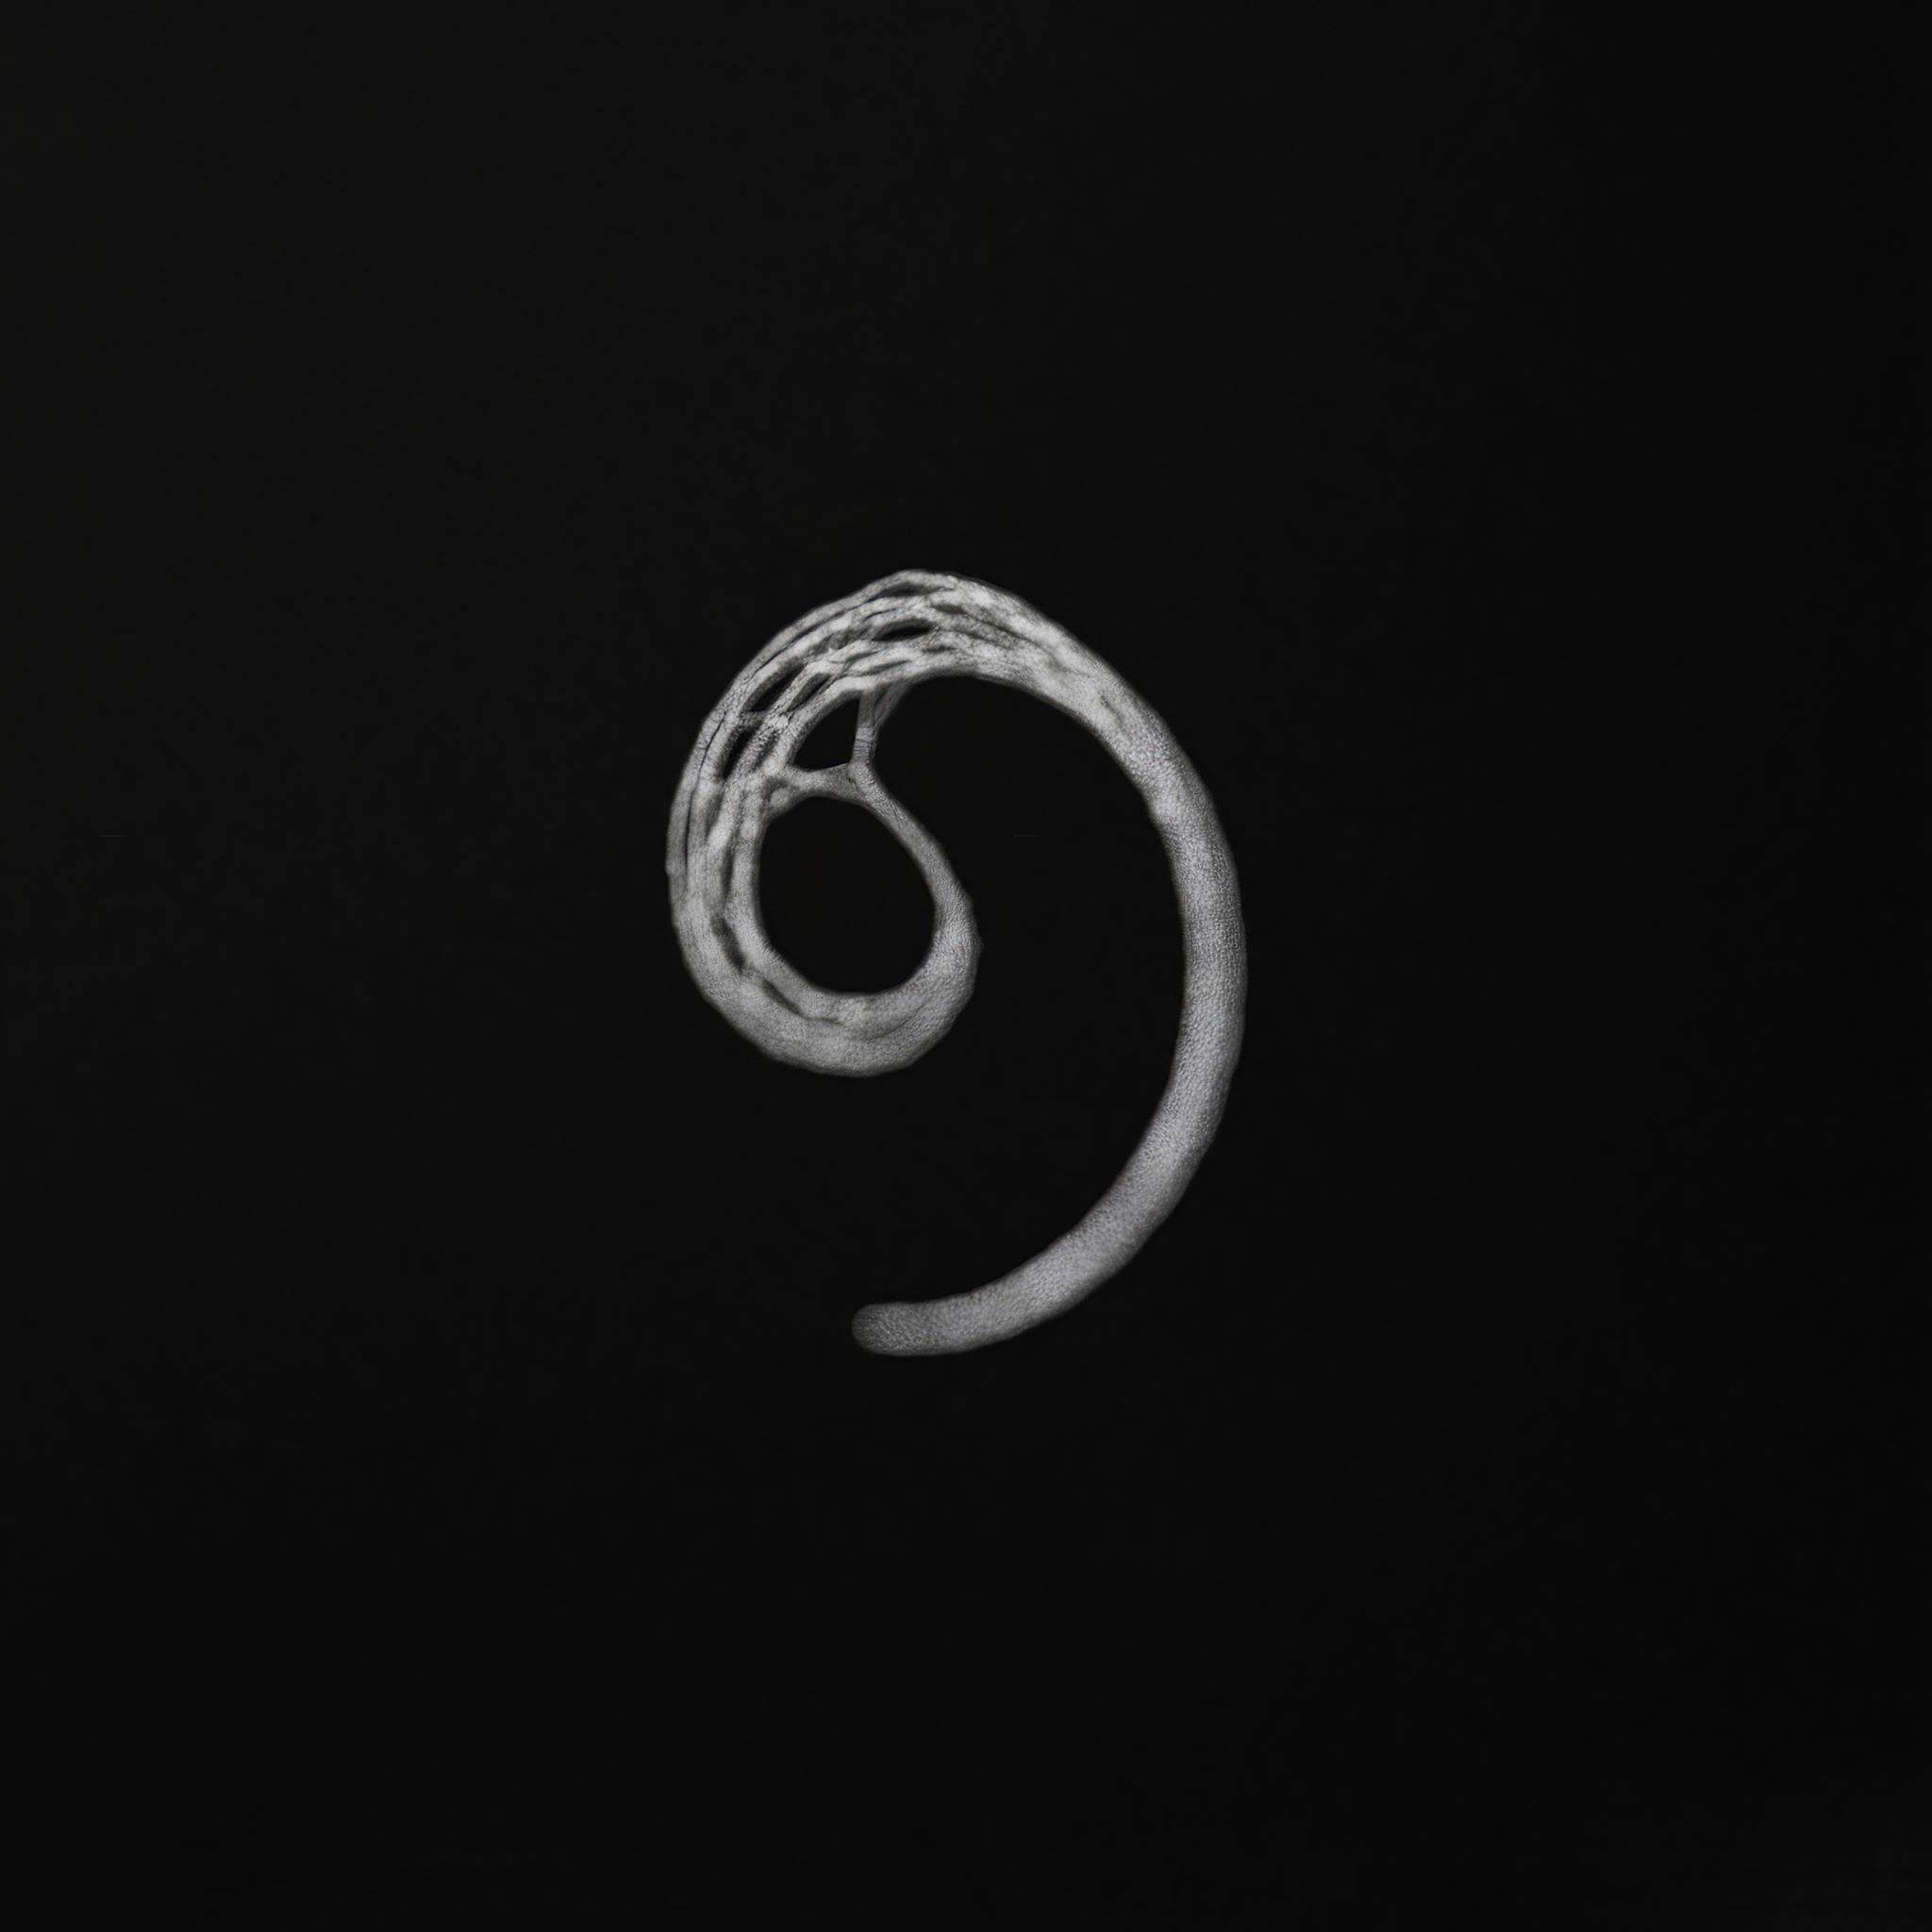 Empty Phenomena Rolling On Image